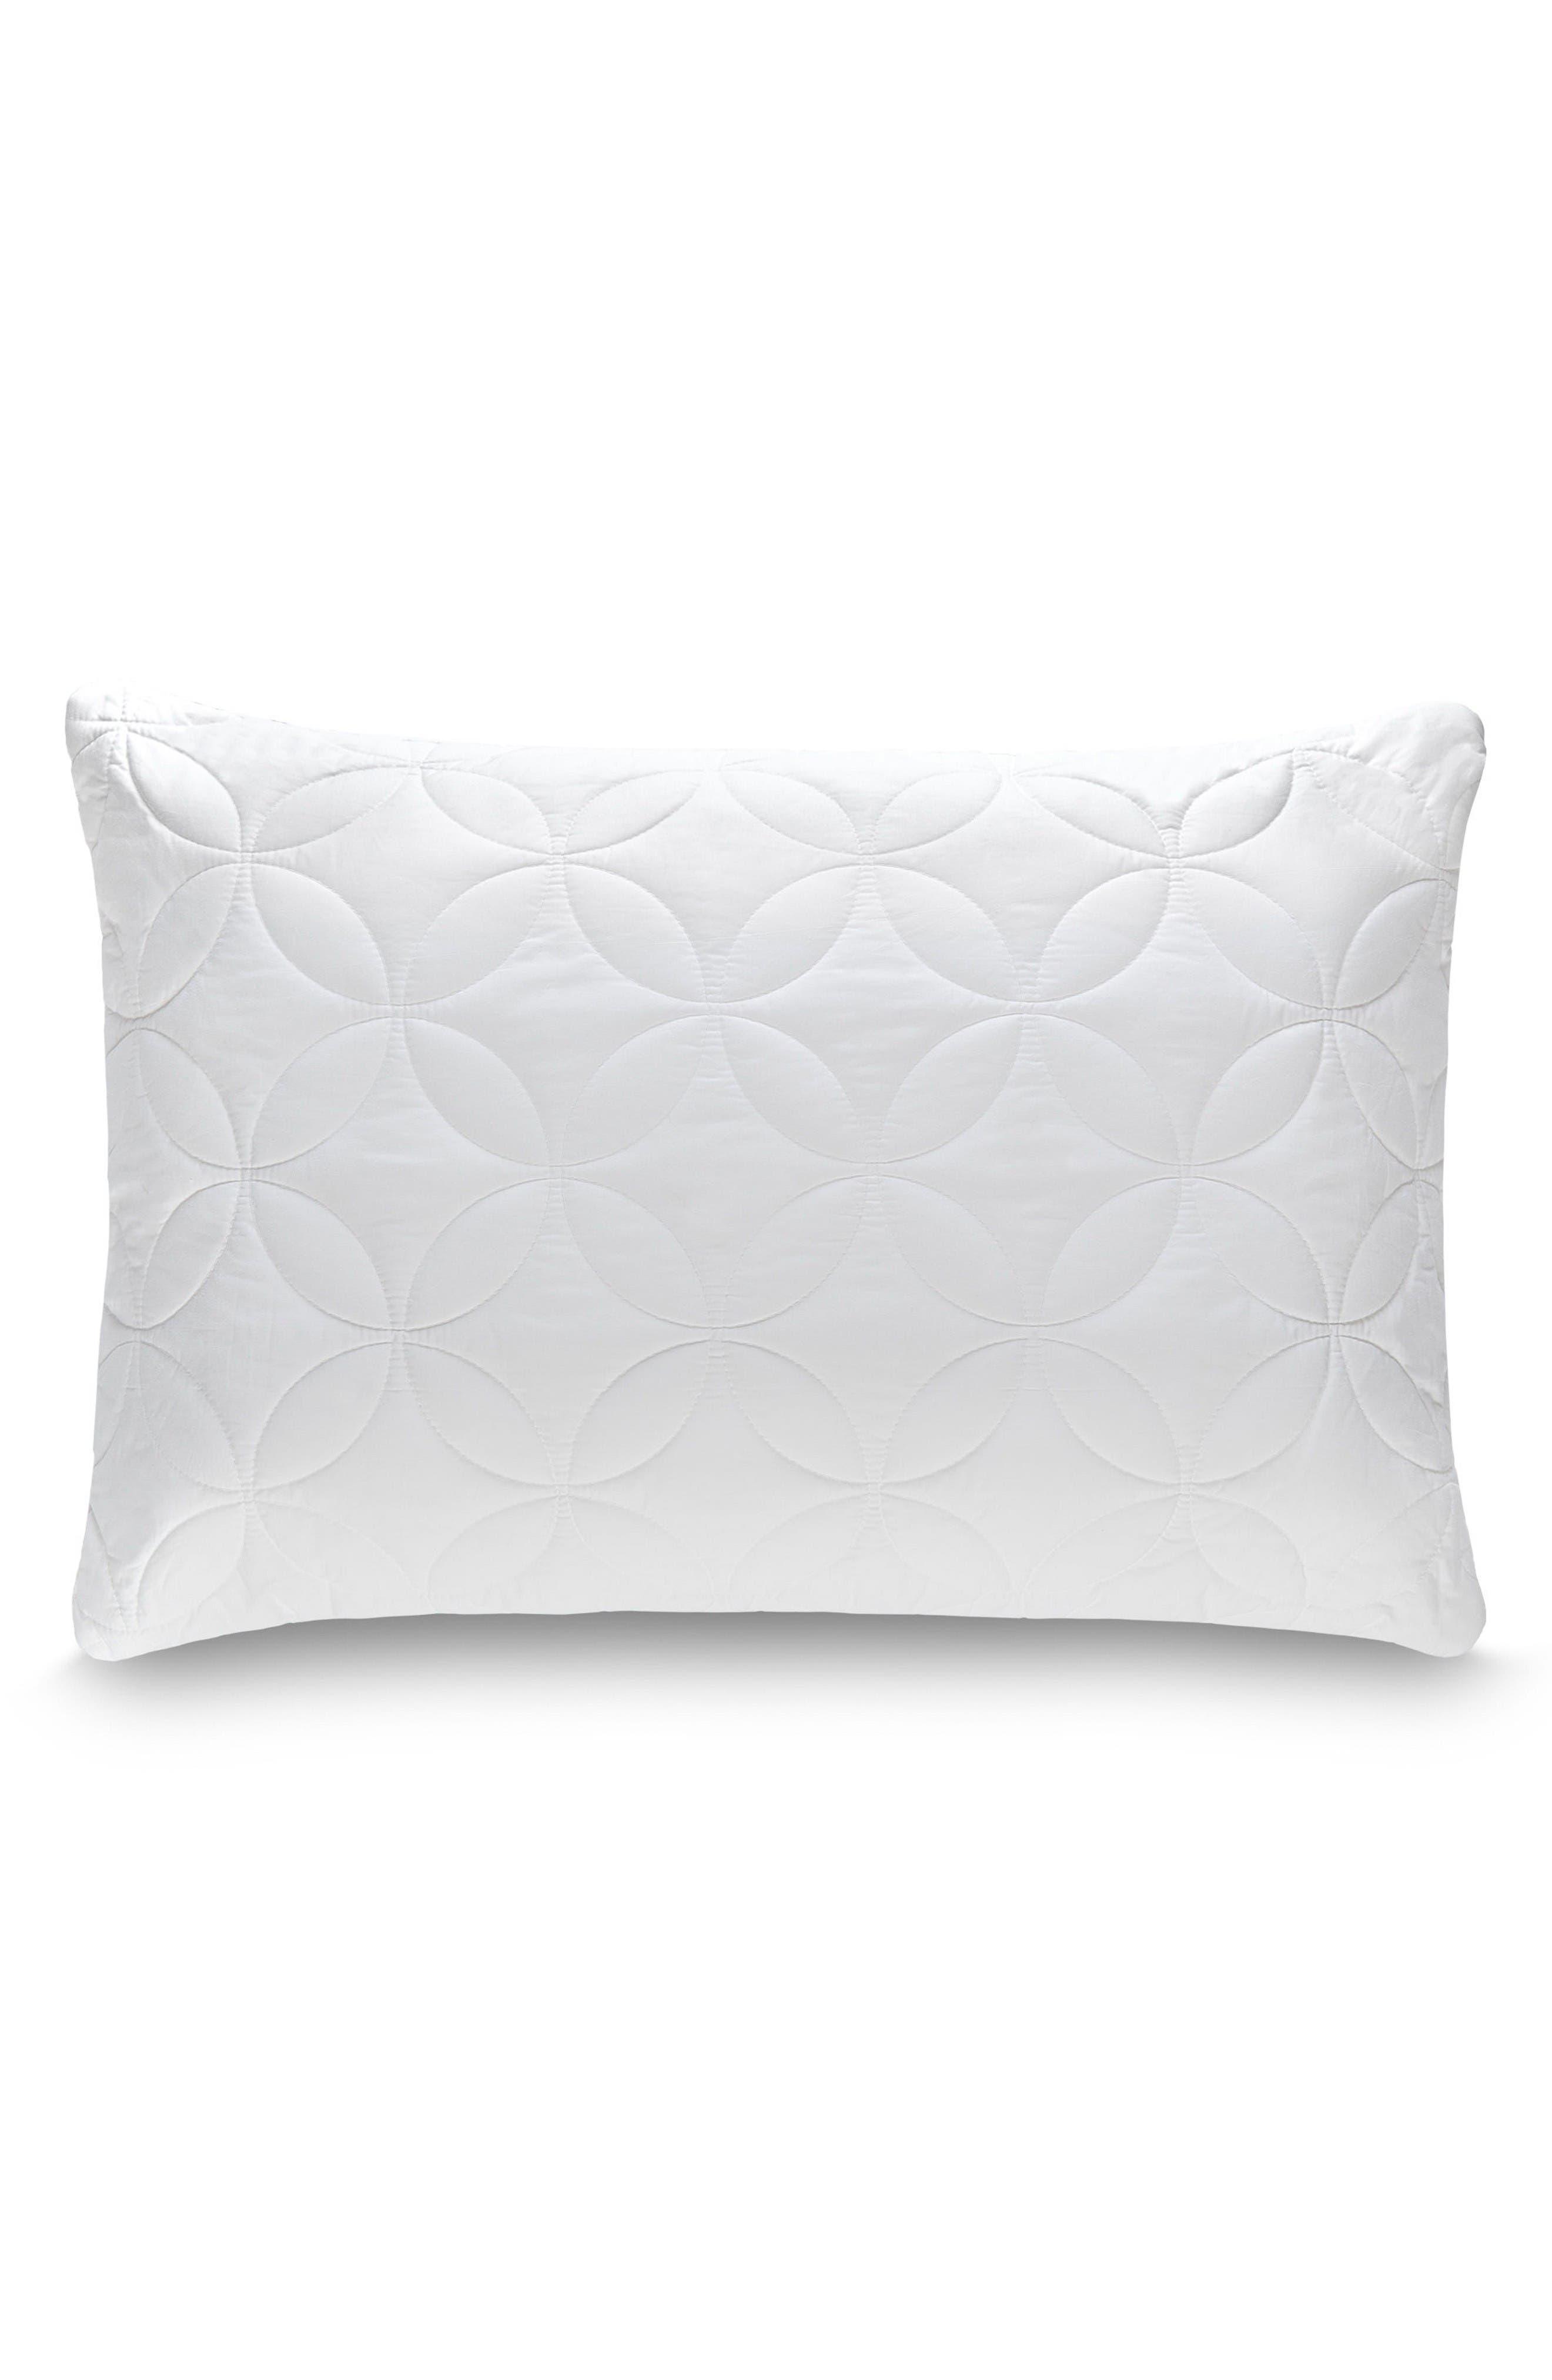 Alternate Image 2  - Tempur-Pedic TEMPUR-Cloud Soft & Conforming Queen Pillow